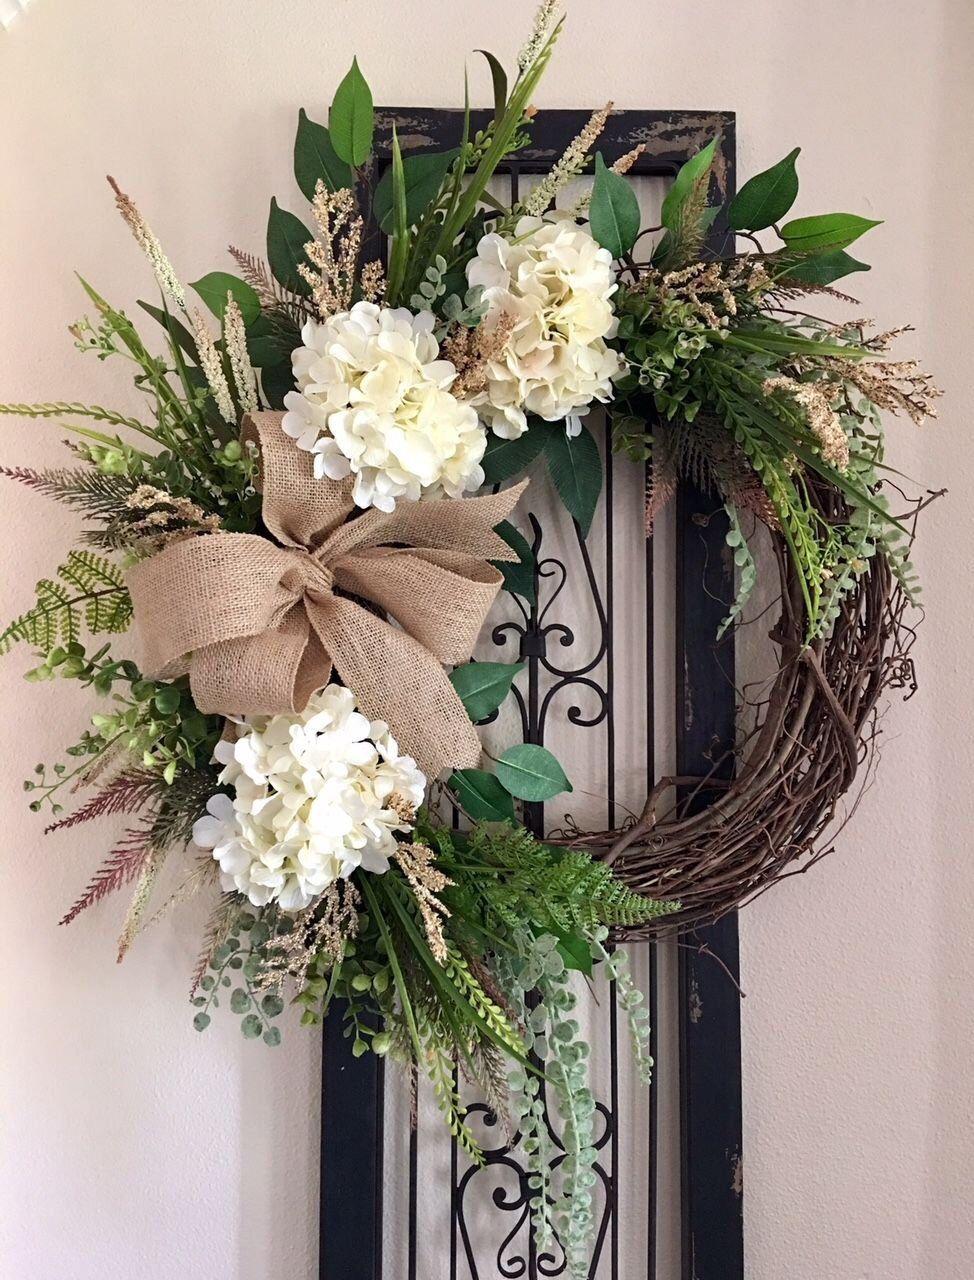 Everyday wreath farmhouse wreath hydrangea wreath all